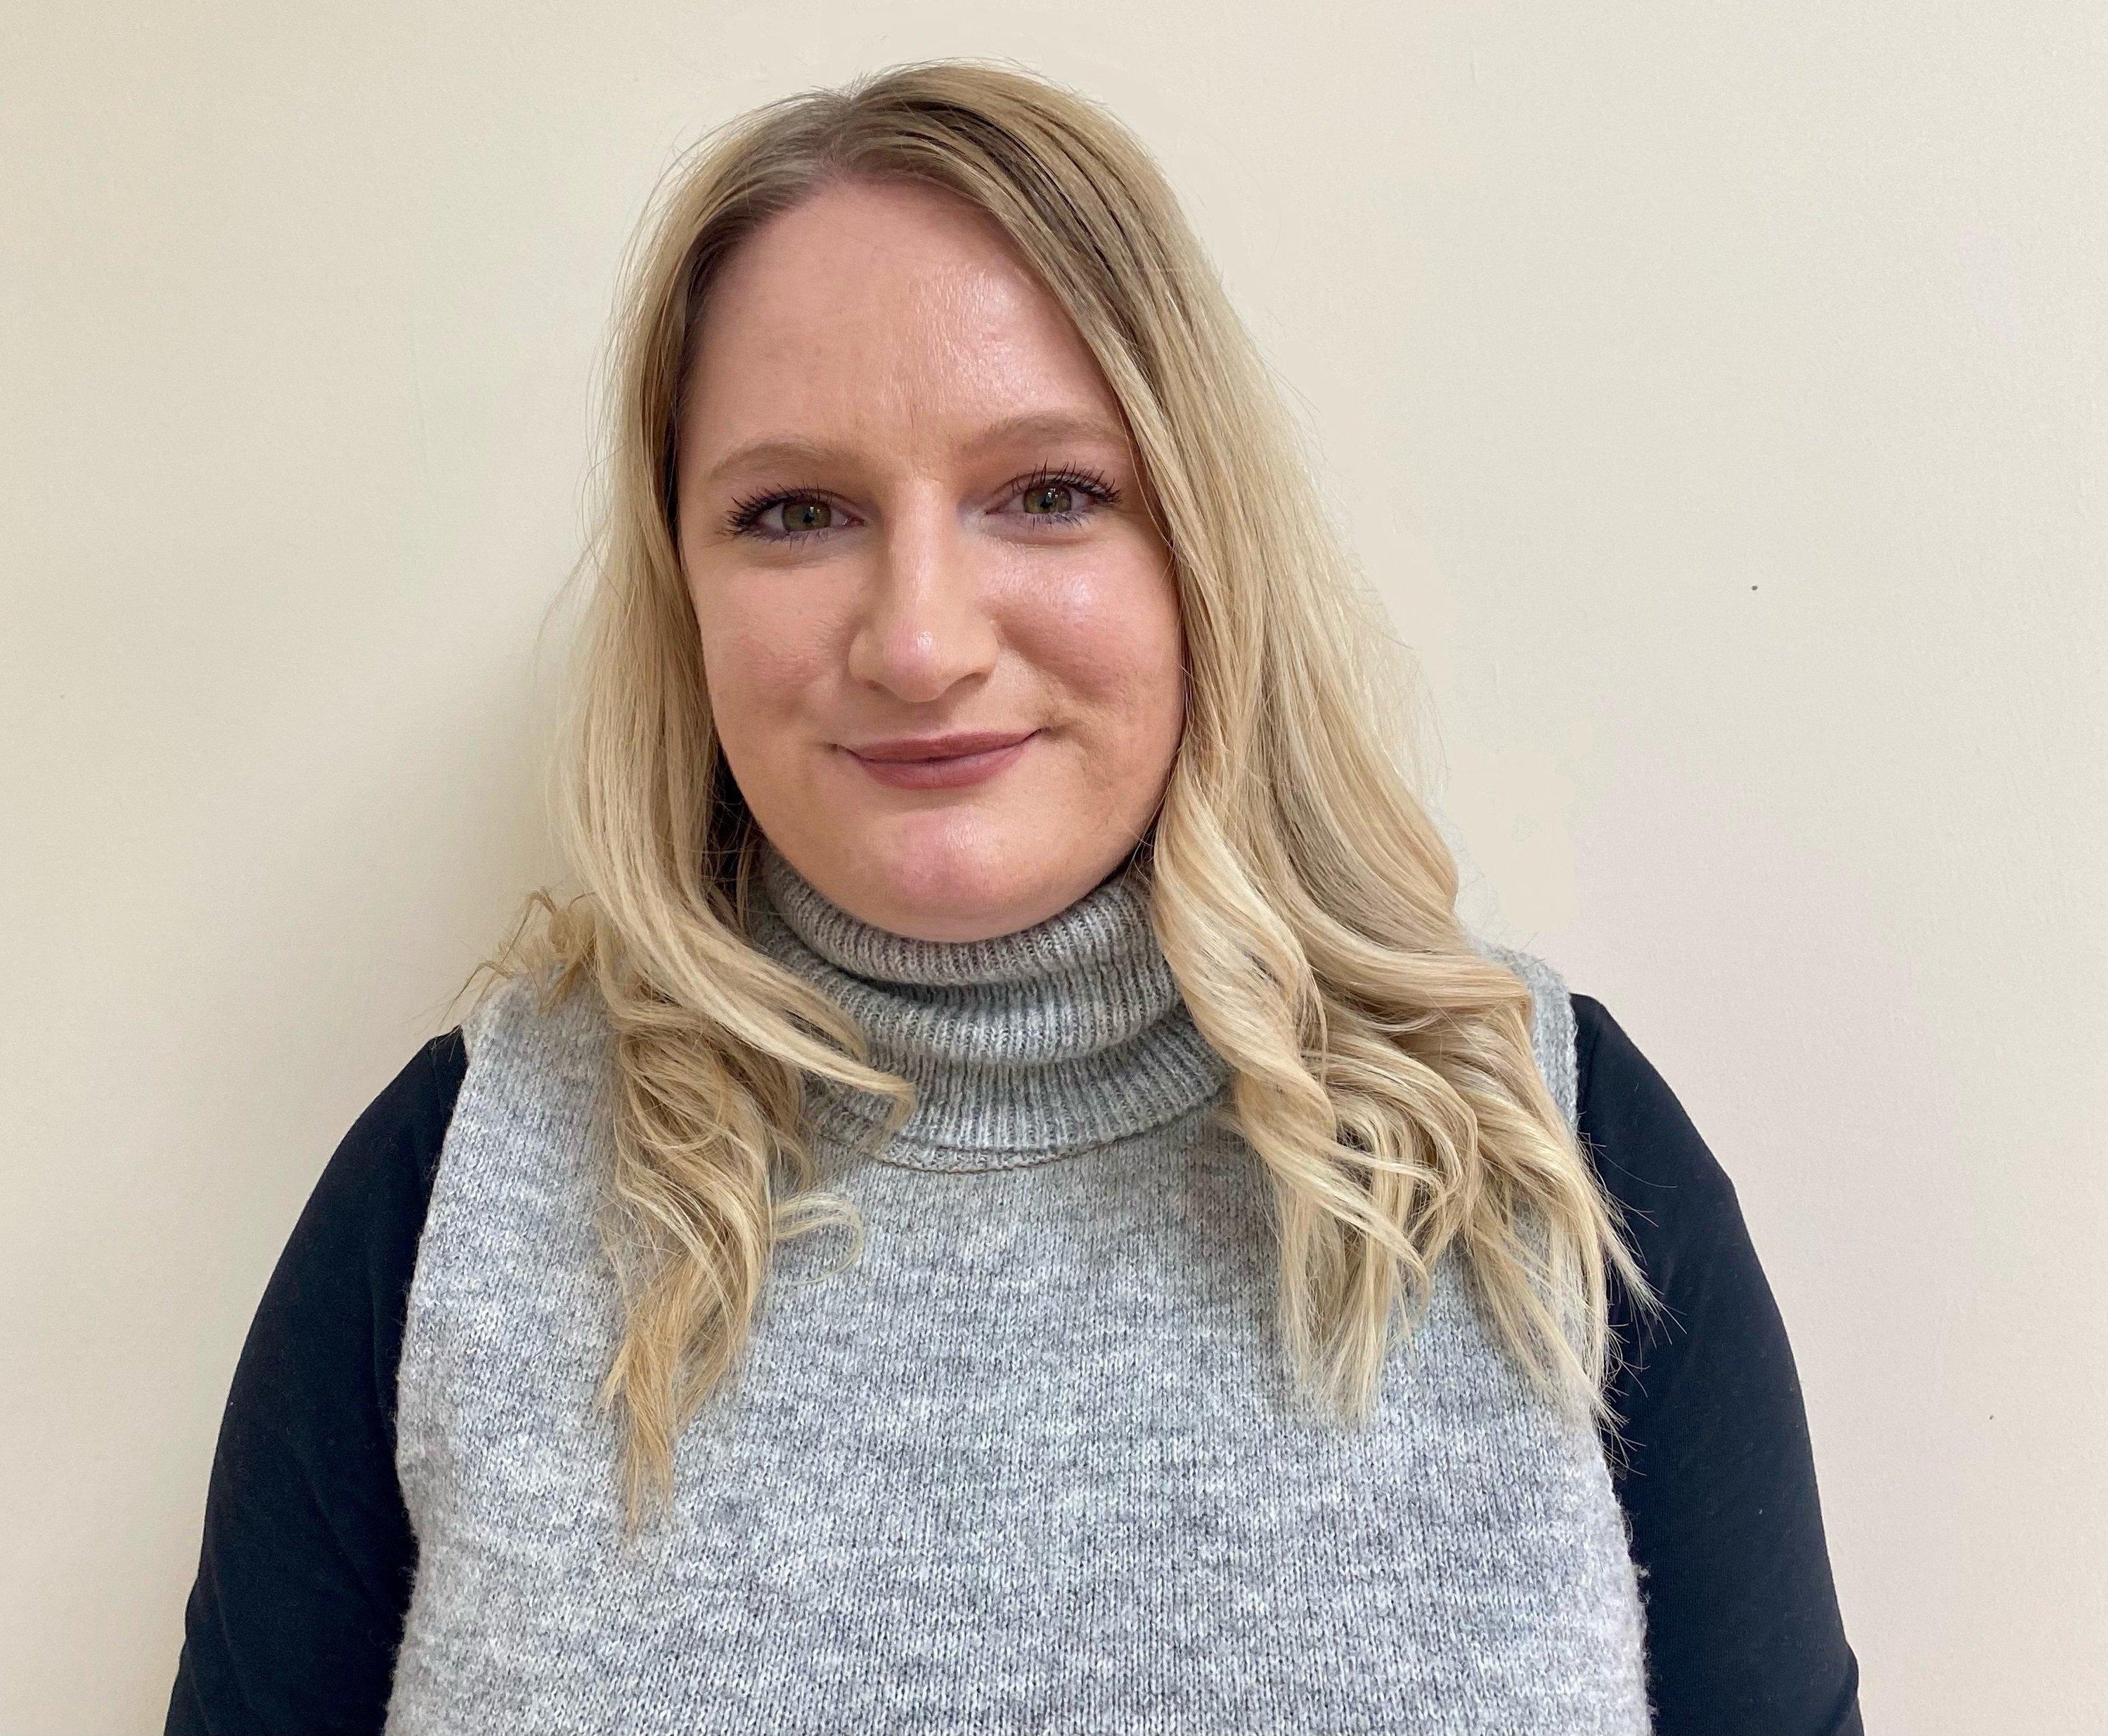 Heathcotes Group appoints Recruitment Business Partner